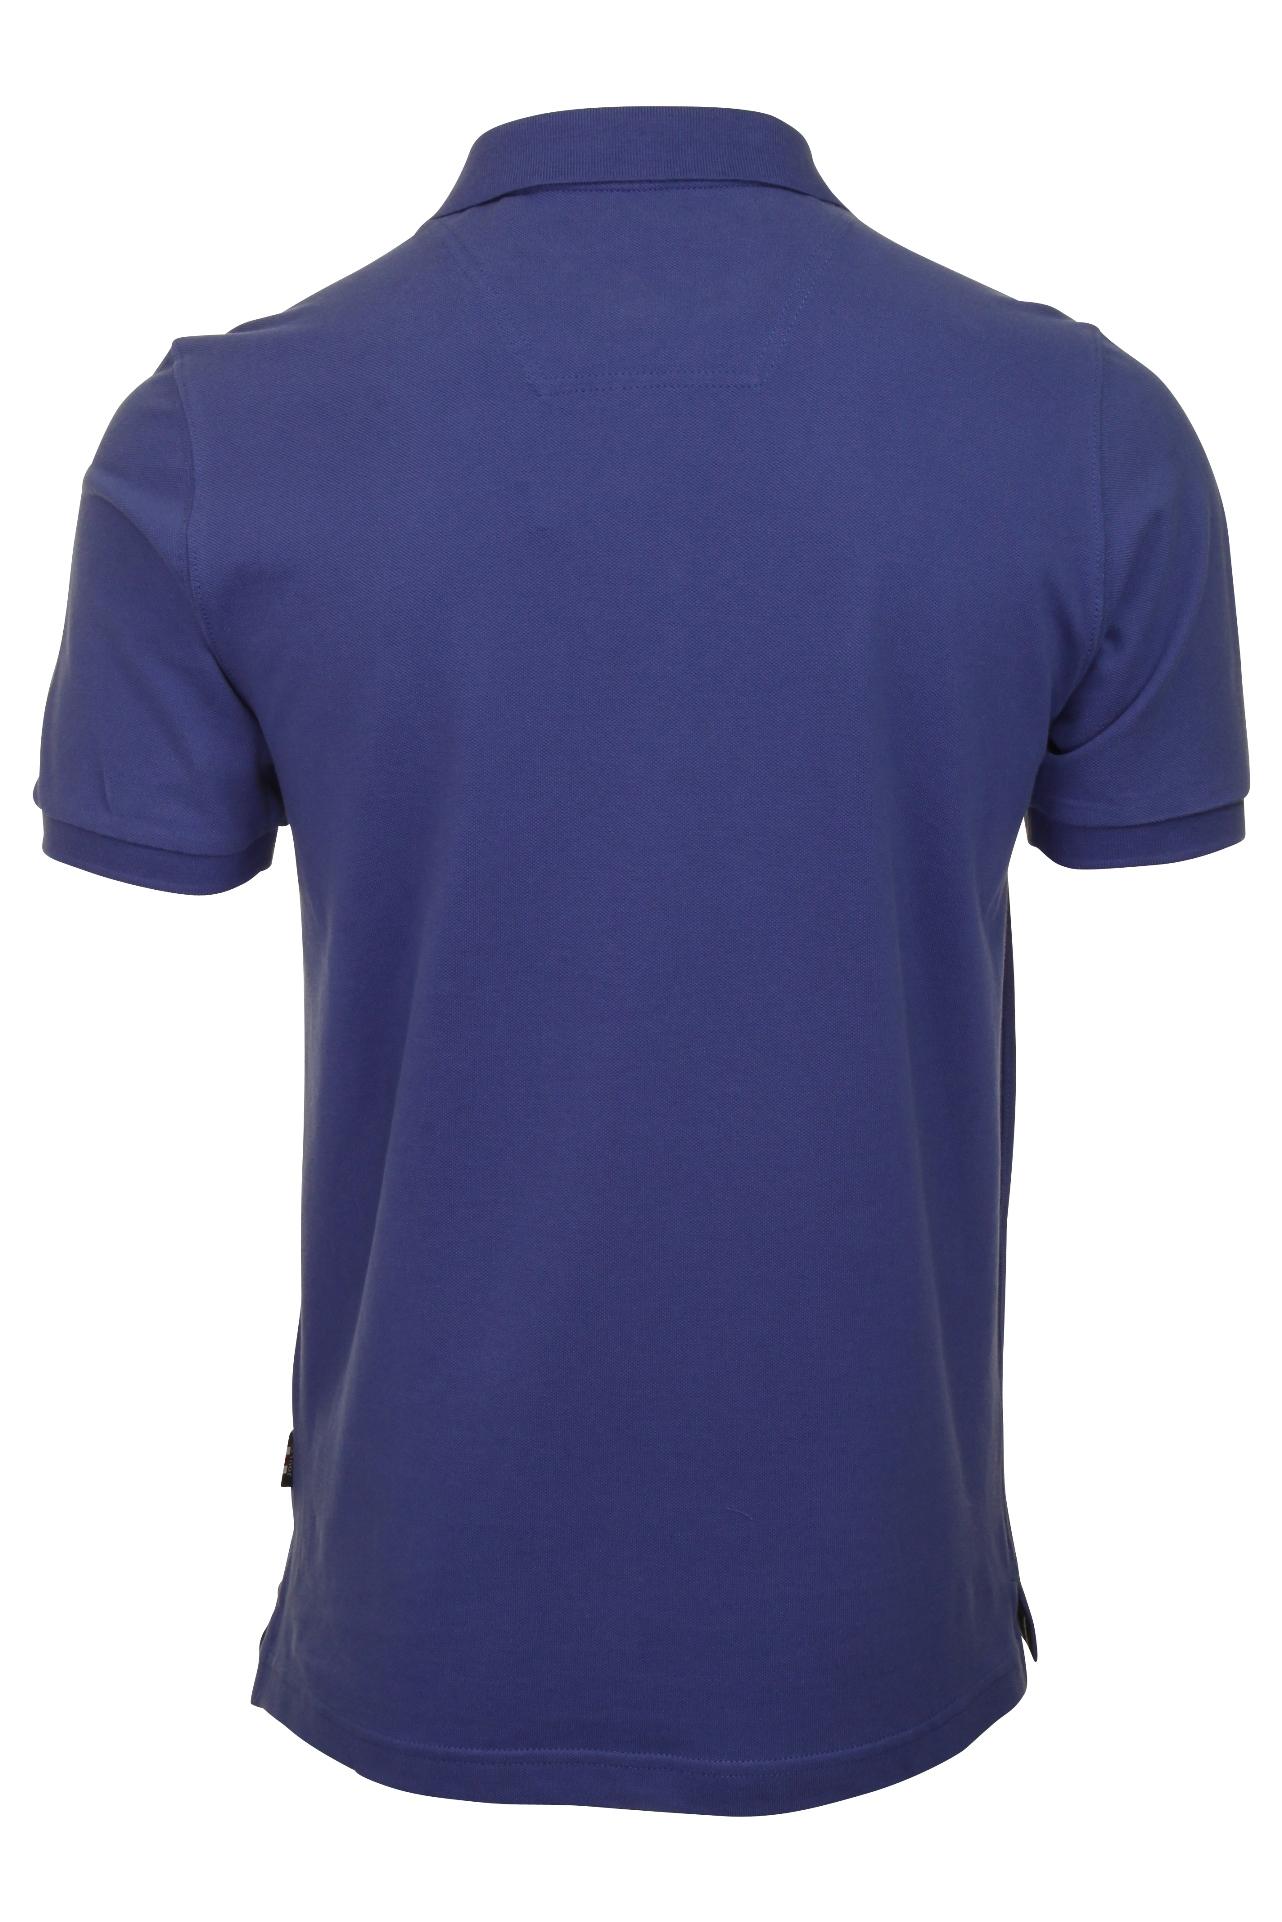 'woody' Col Boutonn T Joules Shirt 6wx6qvt1gh Tl1JFcK